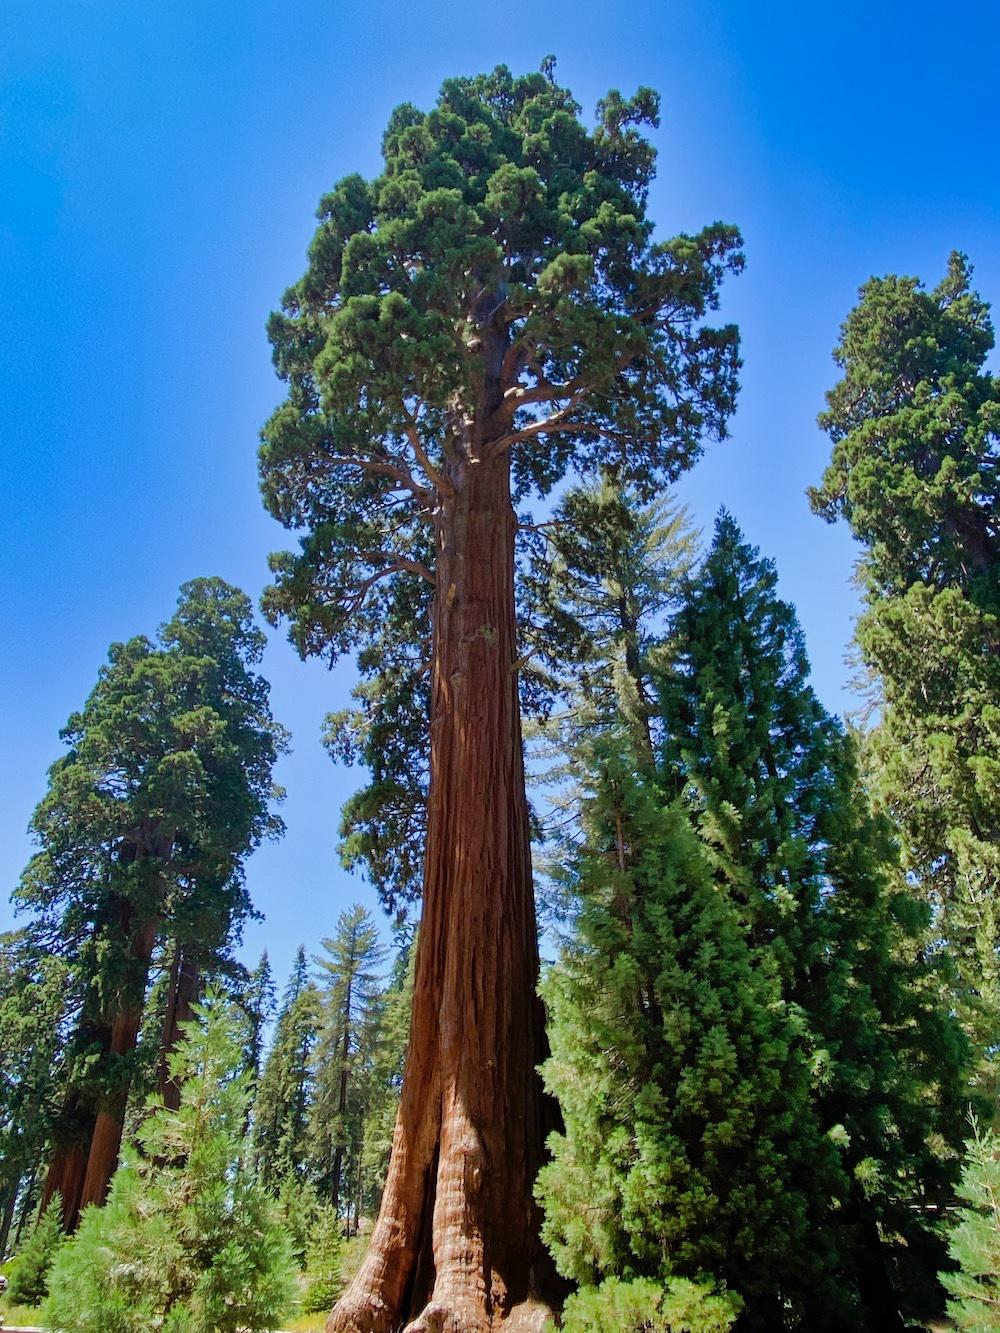 Sequoia National Park - General Sherman Tree 2